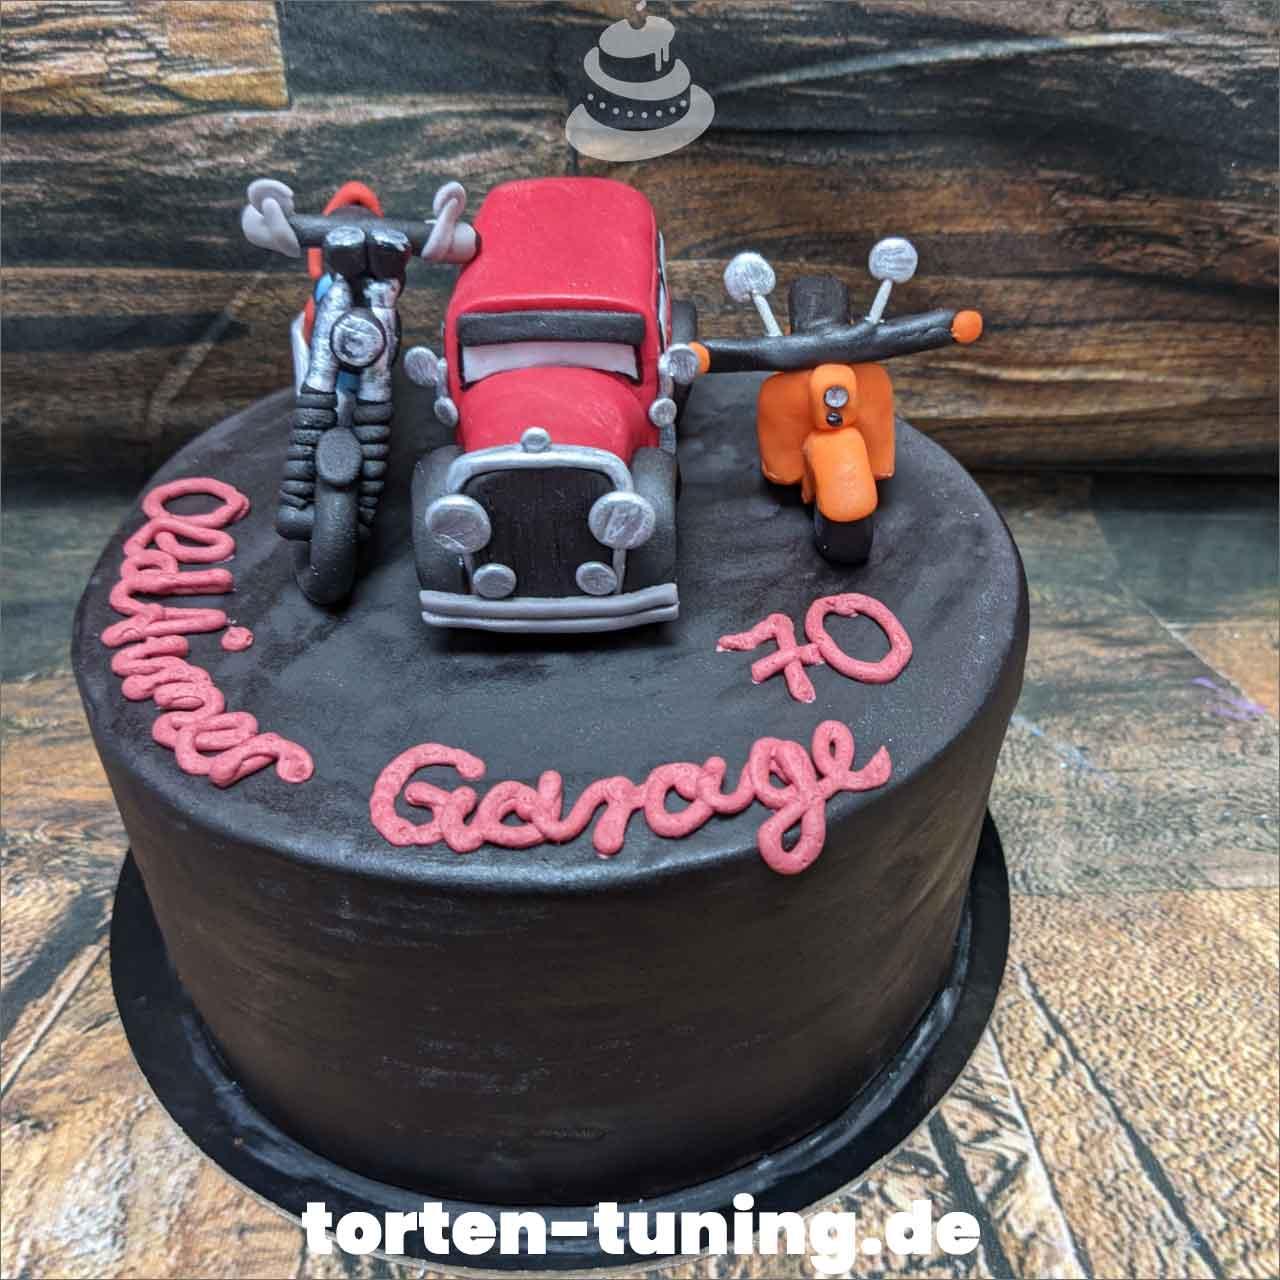 Oldtimer MZ Awo Opel Dripcake Obsttorte Geburtstagstorte Motivtorte Torte Tortendekoration Torte online bestellen Suhl Thüringen Torten Tuning Sahnetorte Tortenfiguren Cake Topper